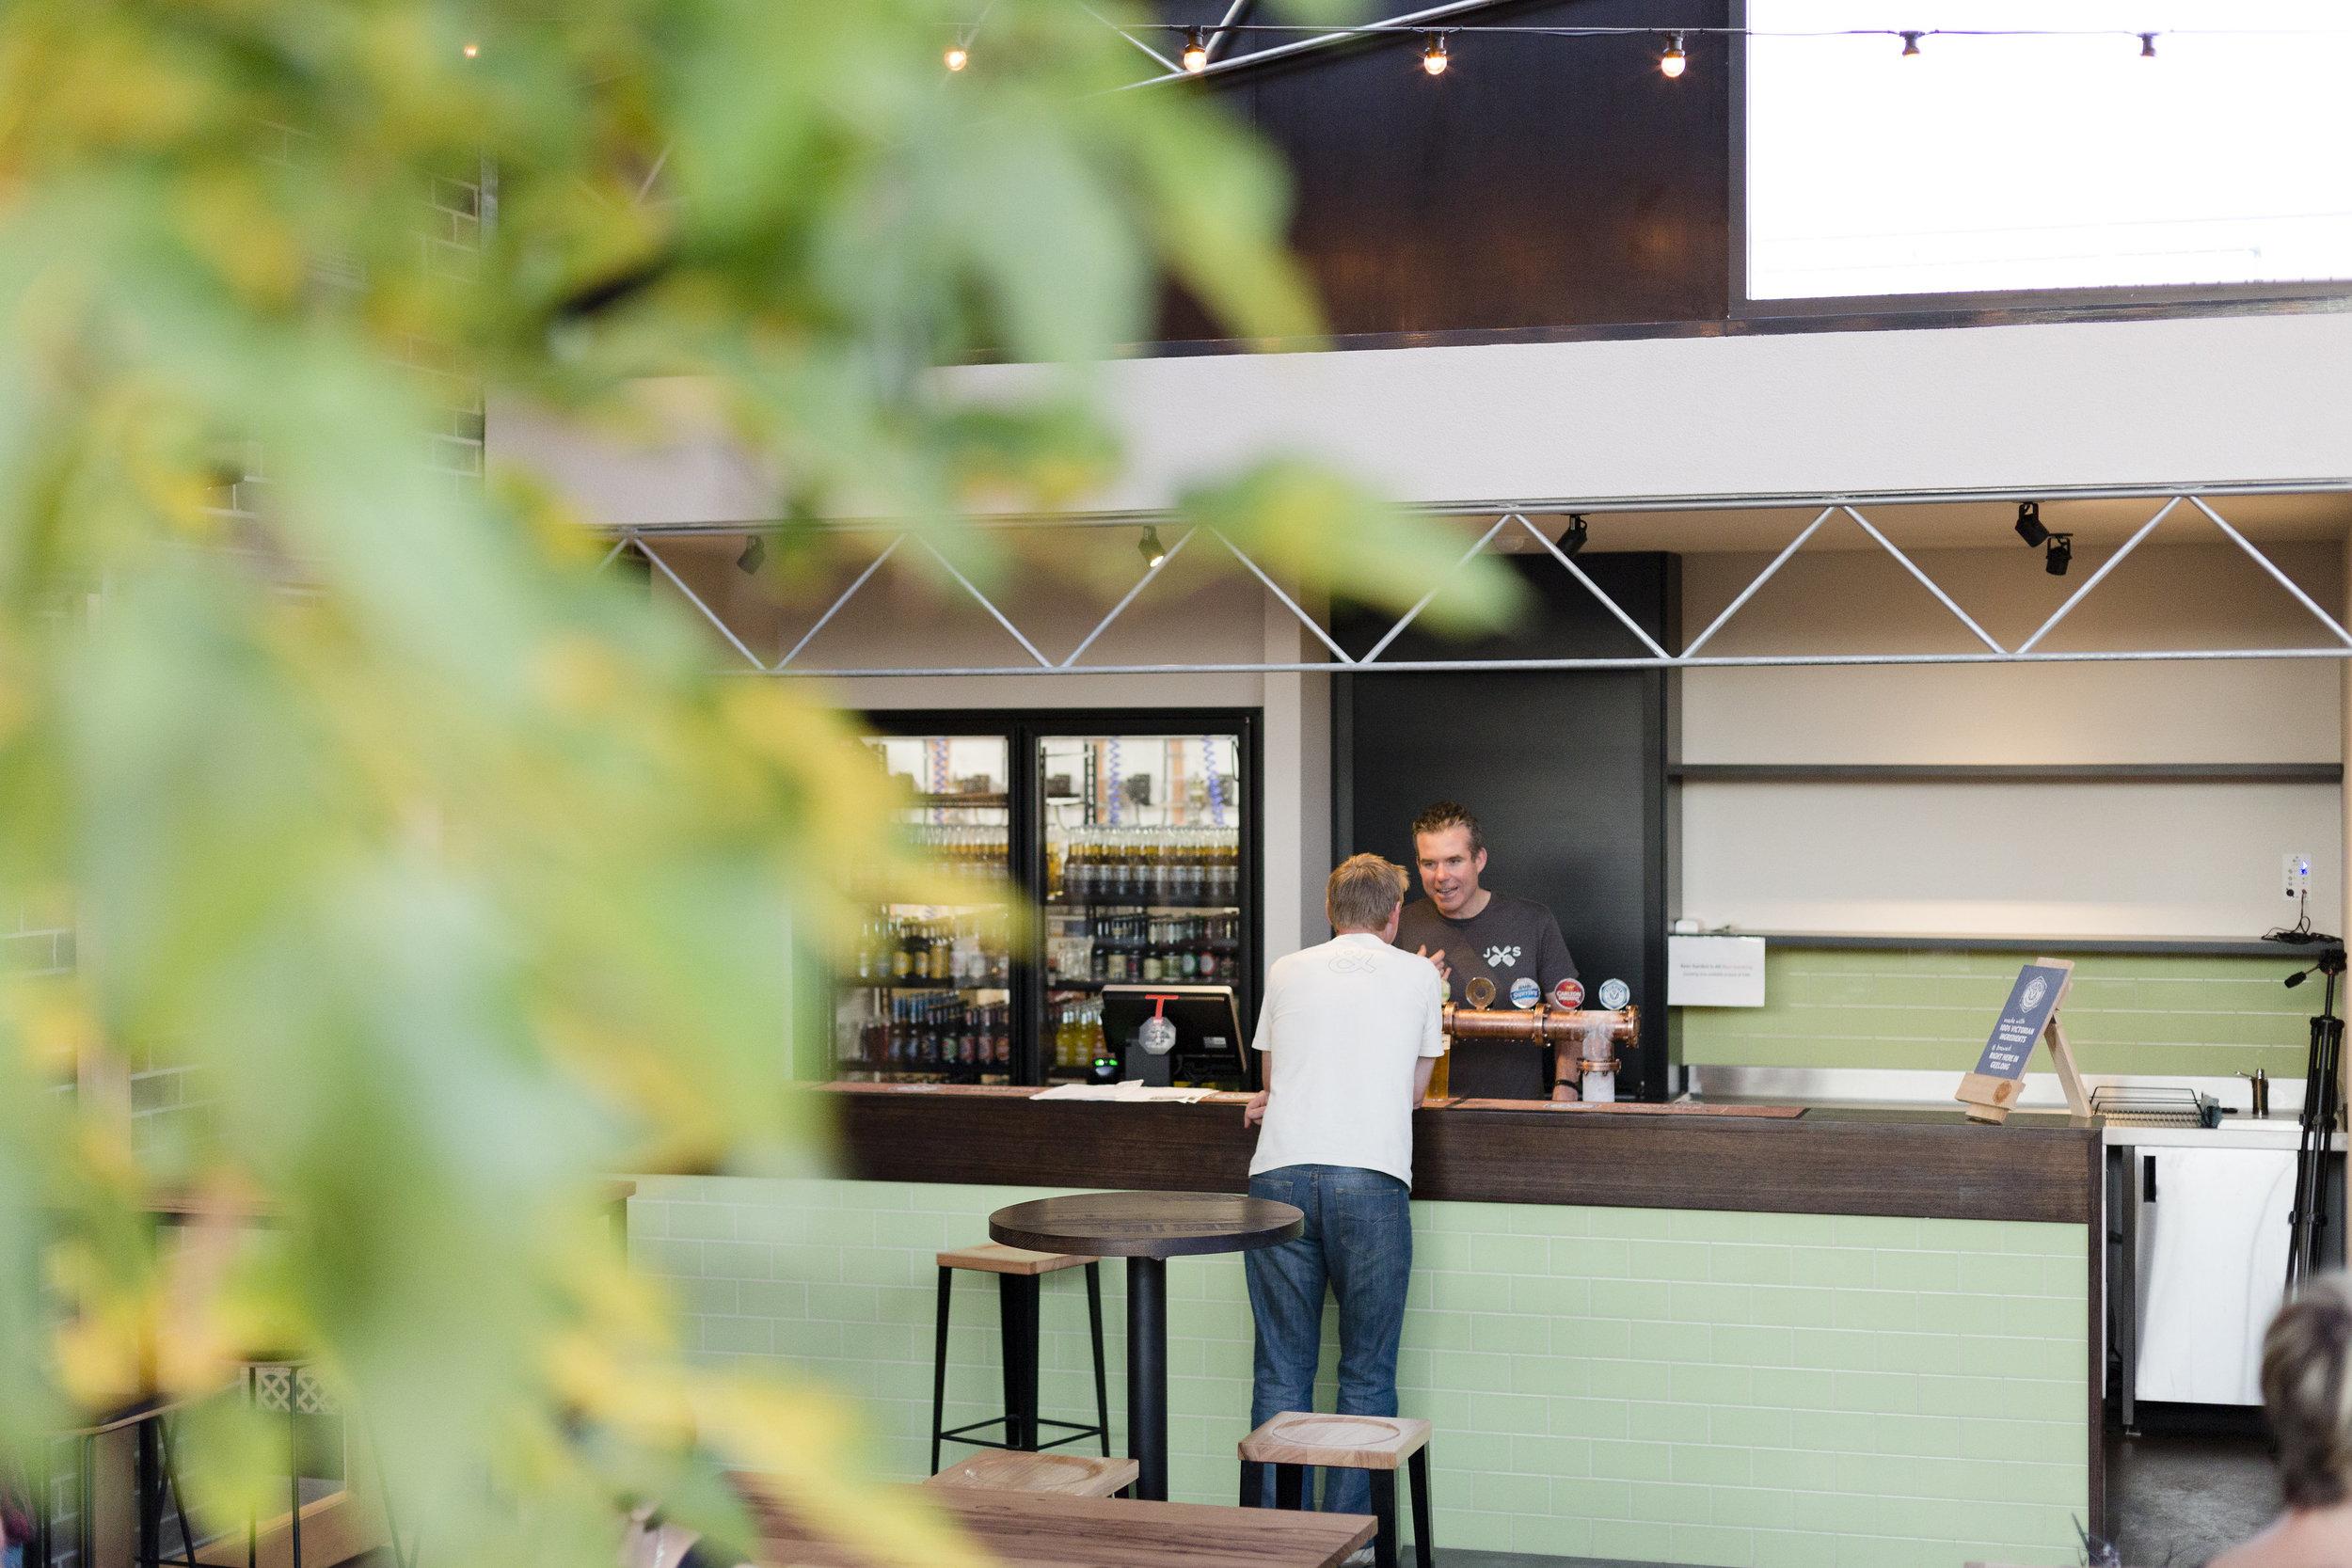 cally hotel beer garden interior design.jpg